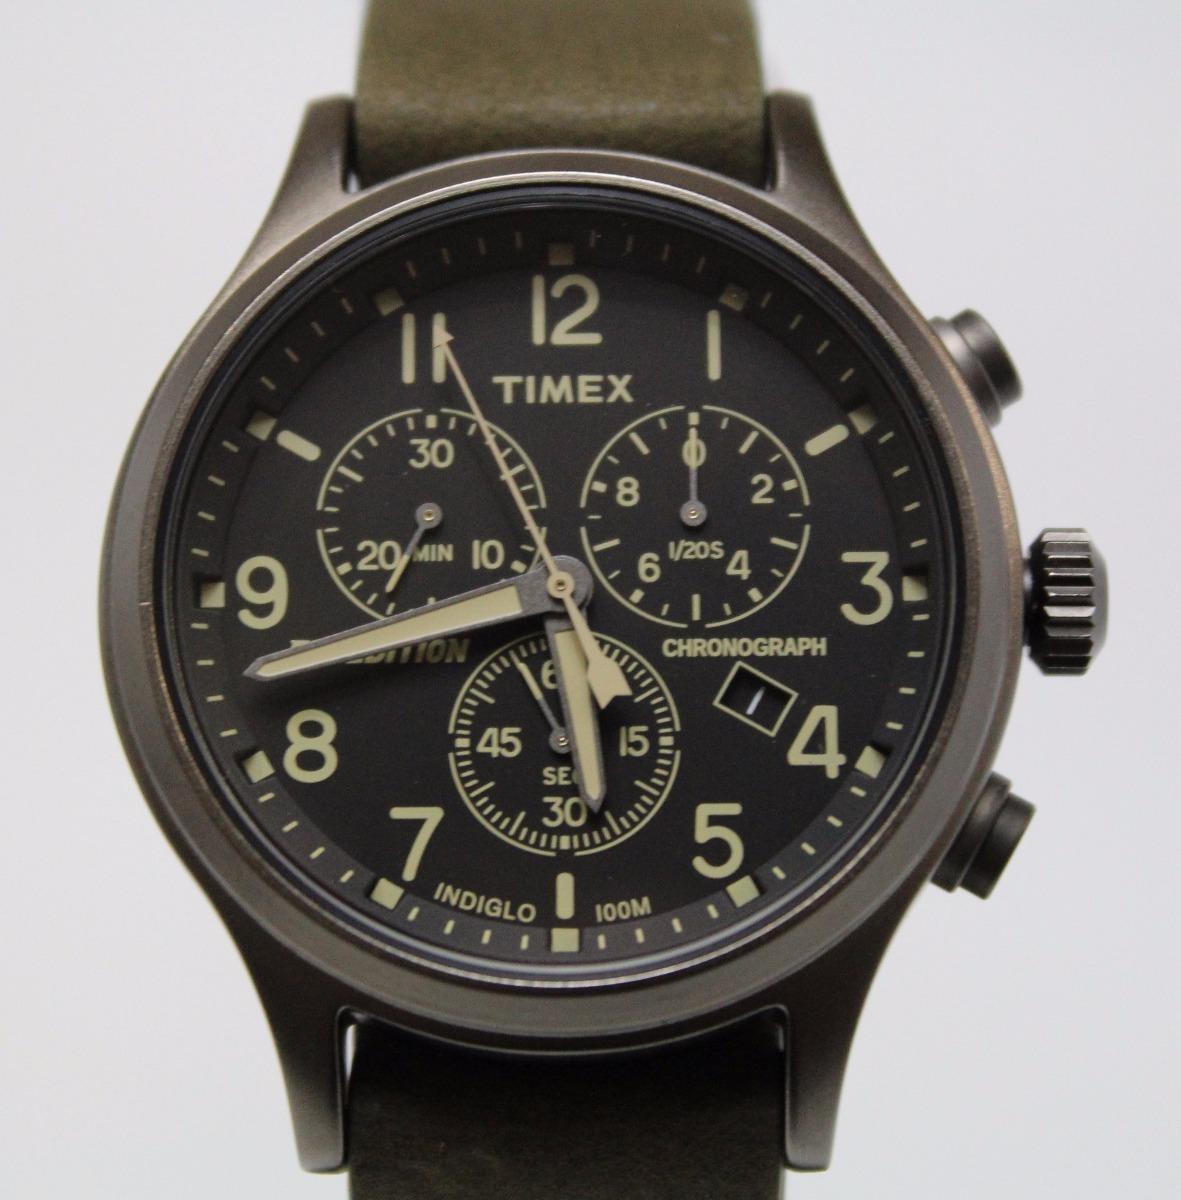 28bbcea55309 reloj timex expedition tw4b04100 caballero. Cargando zoom.